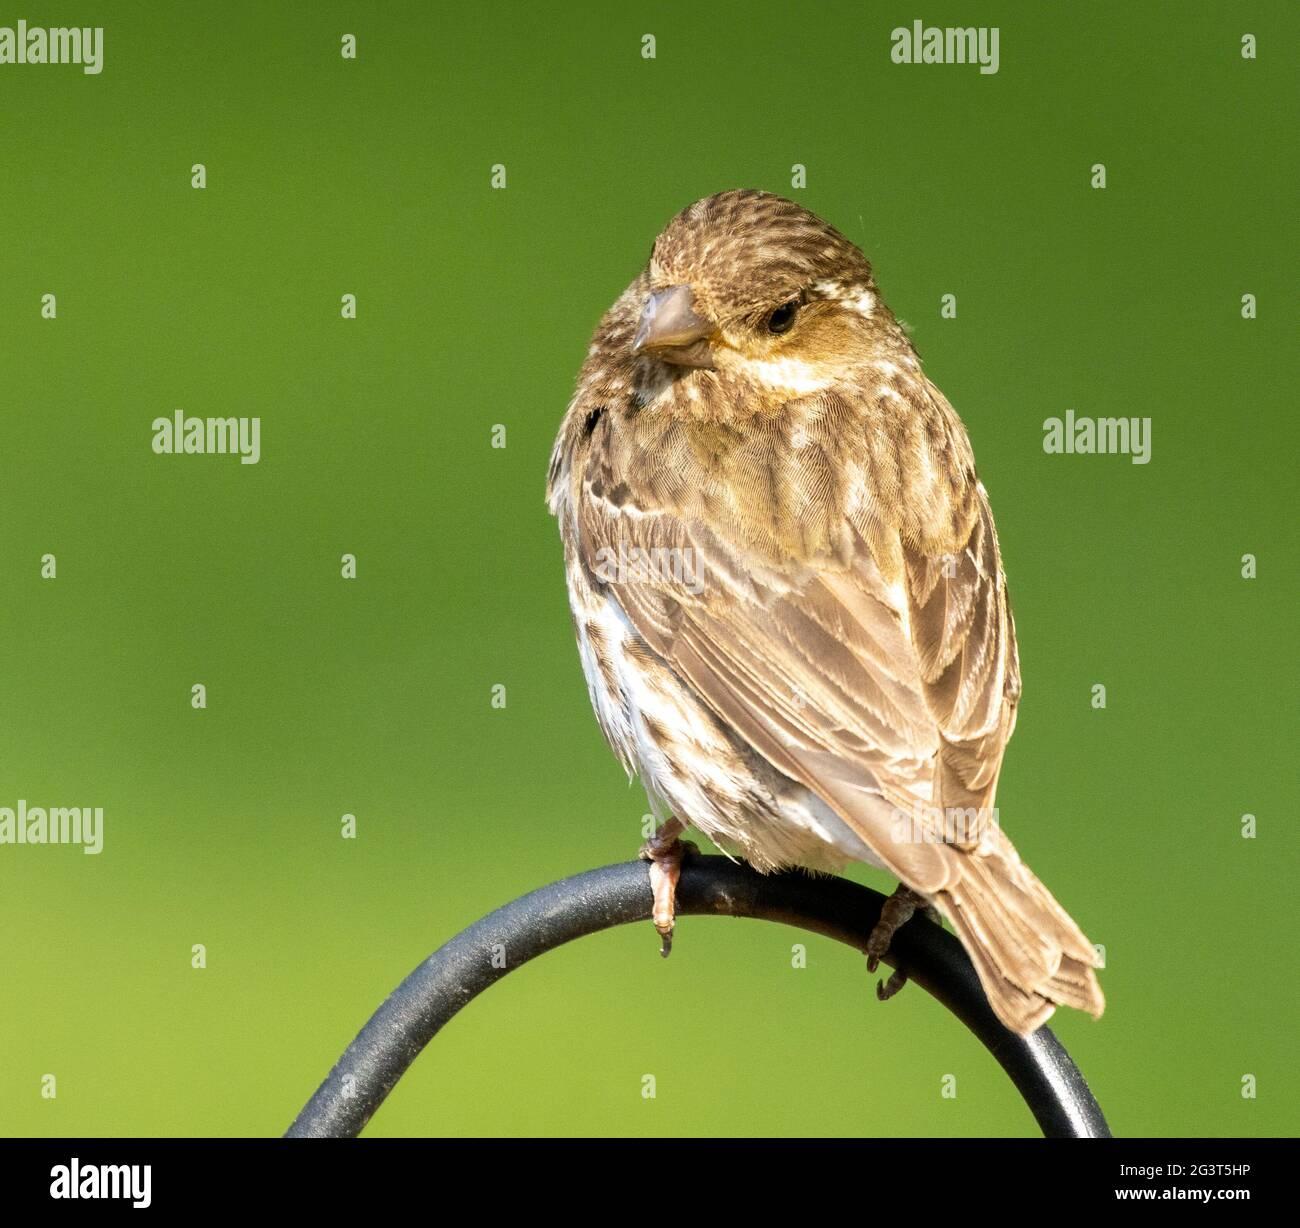 sparrow-perched-on-bar-looking-backward-